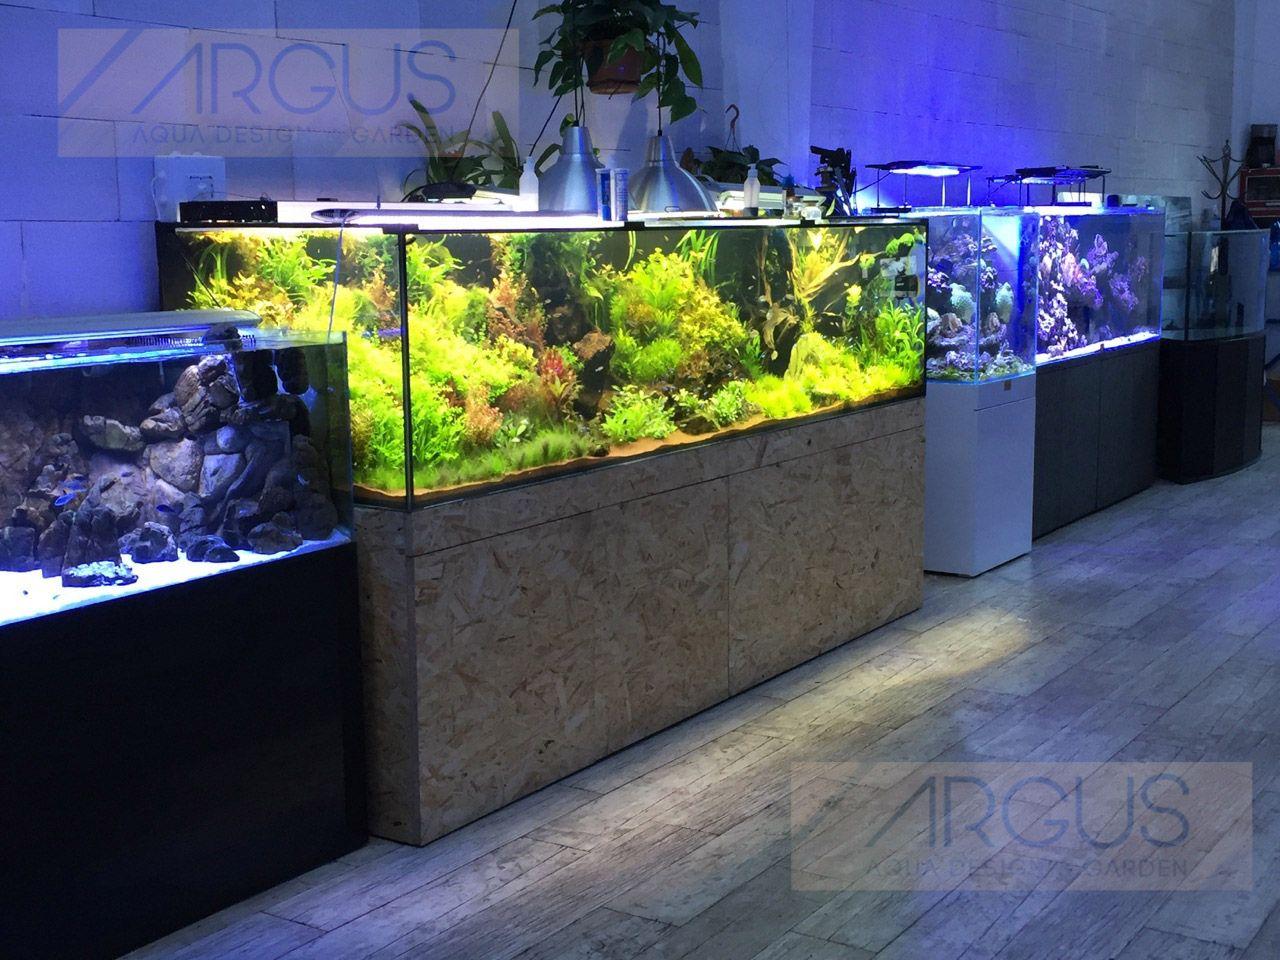 Argus aquarium jakub dymek akwarium roślinne pinterest